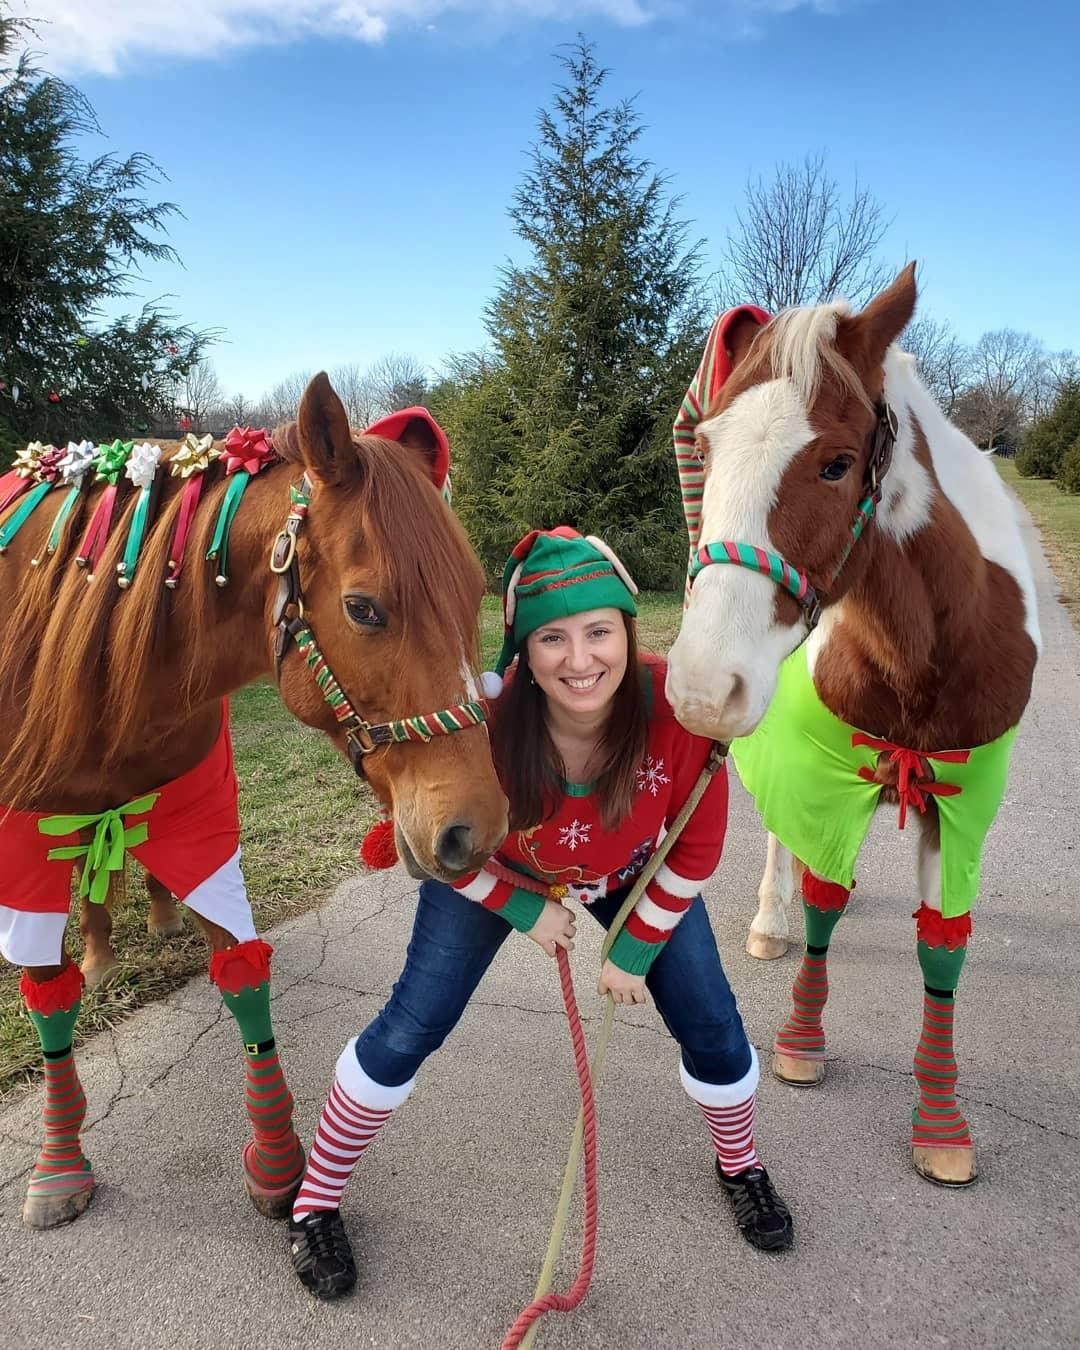 Desafio fotográfico: Boas festas | HORSE NATION 6